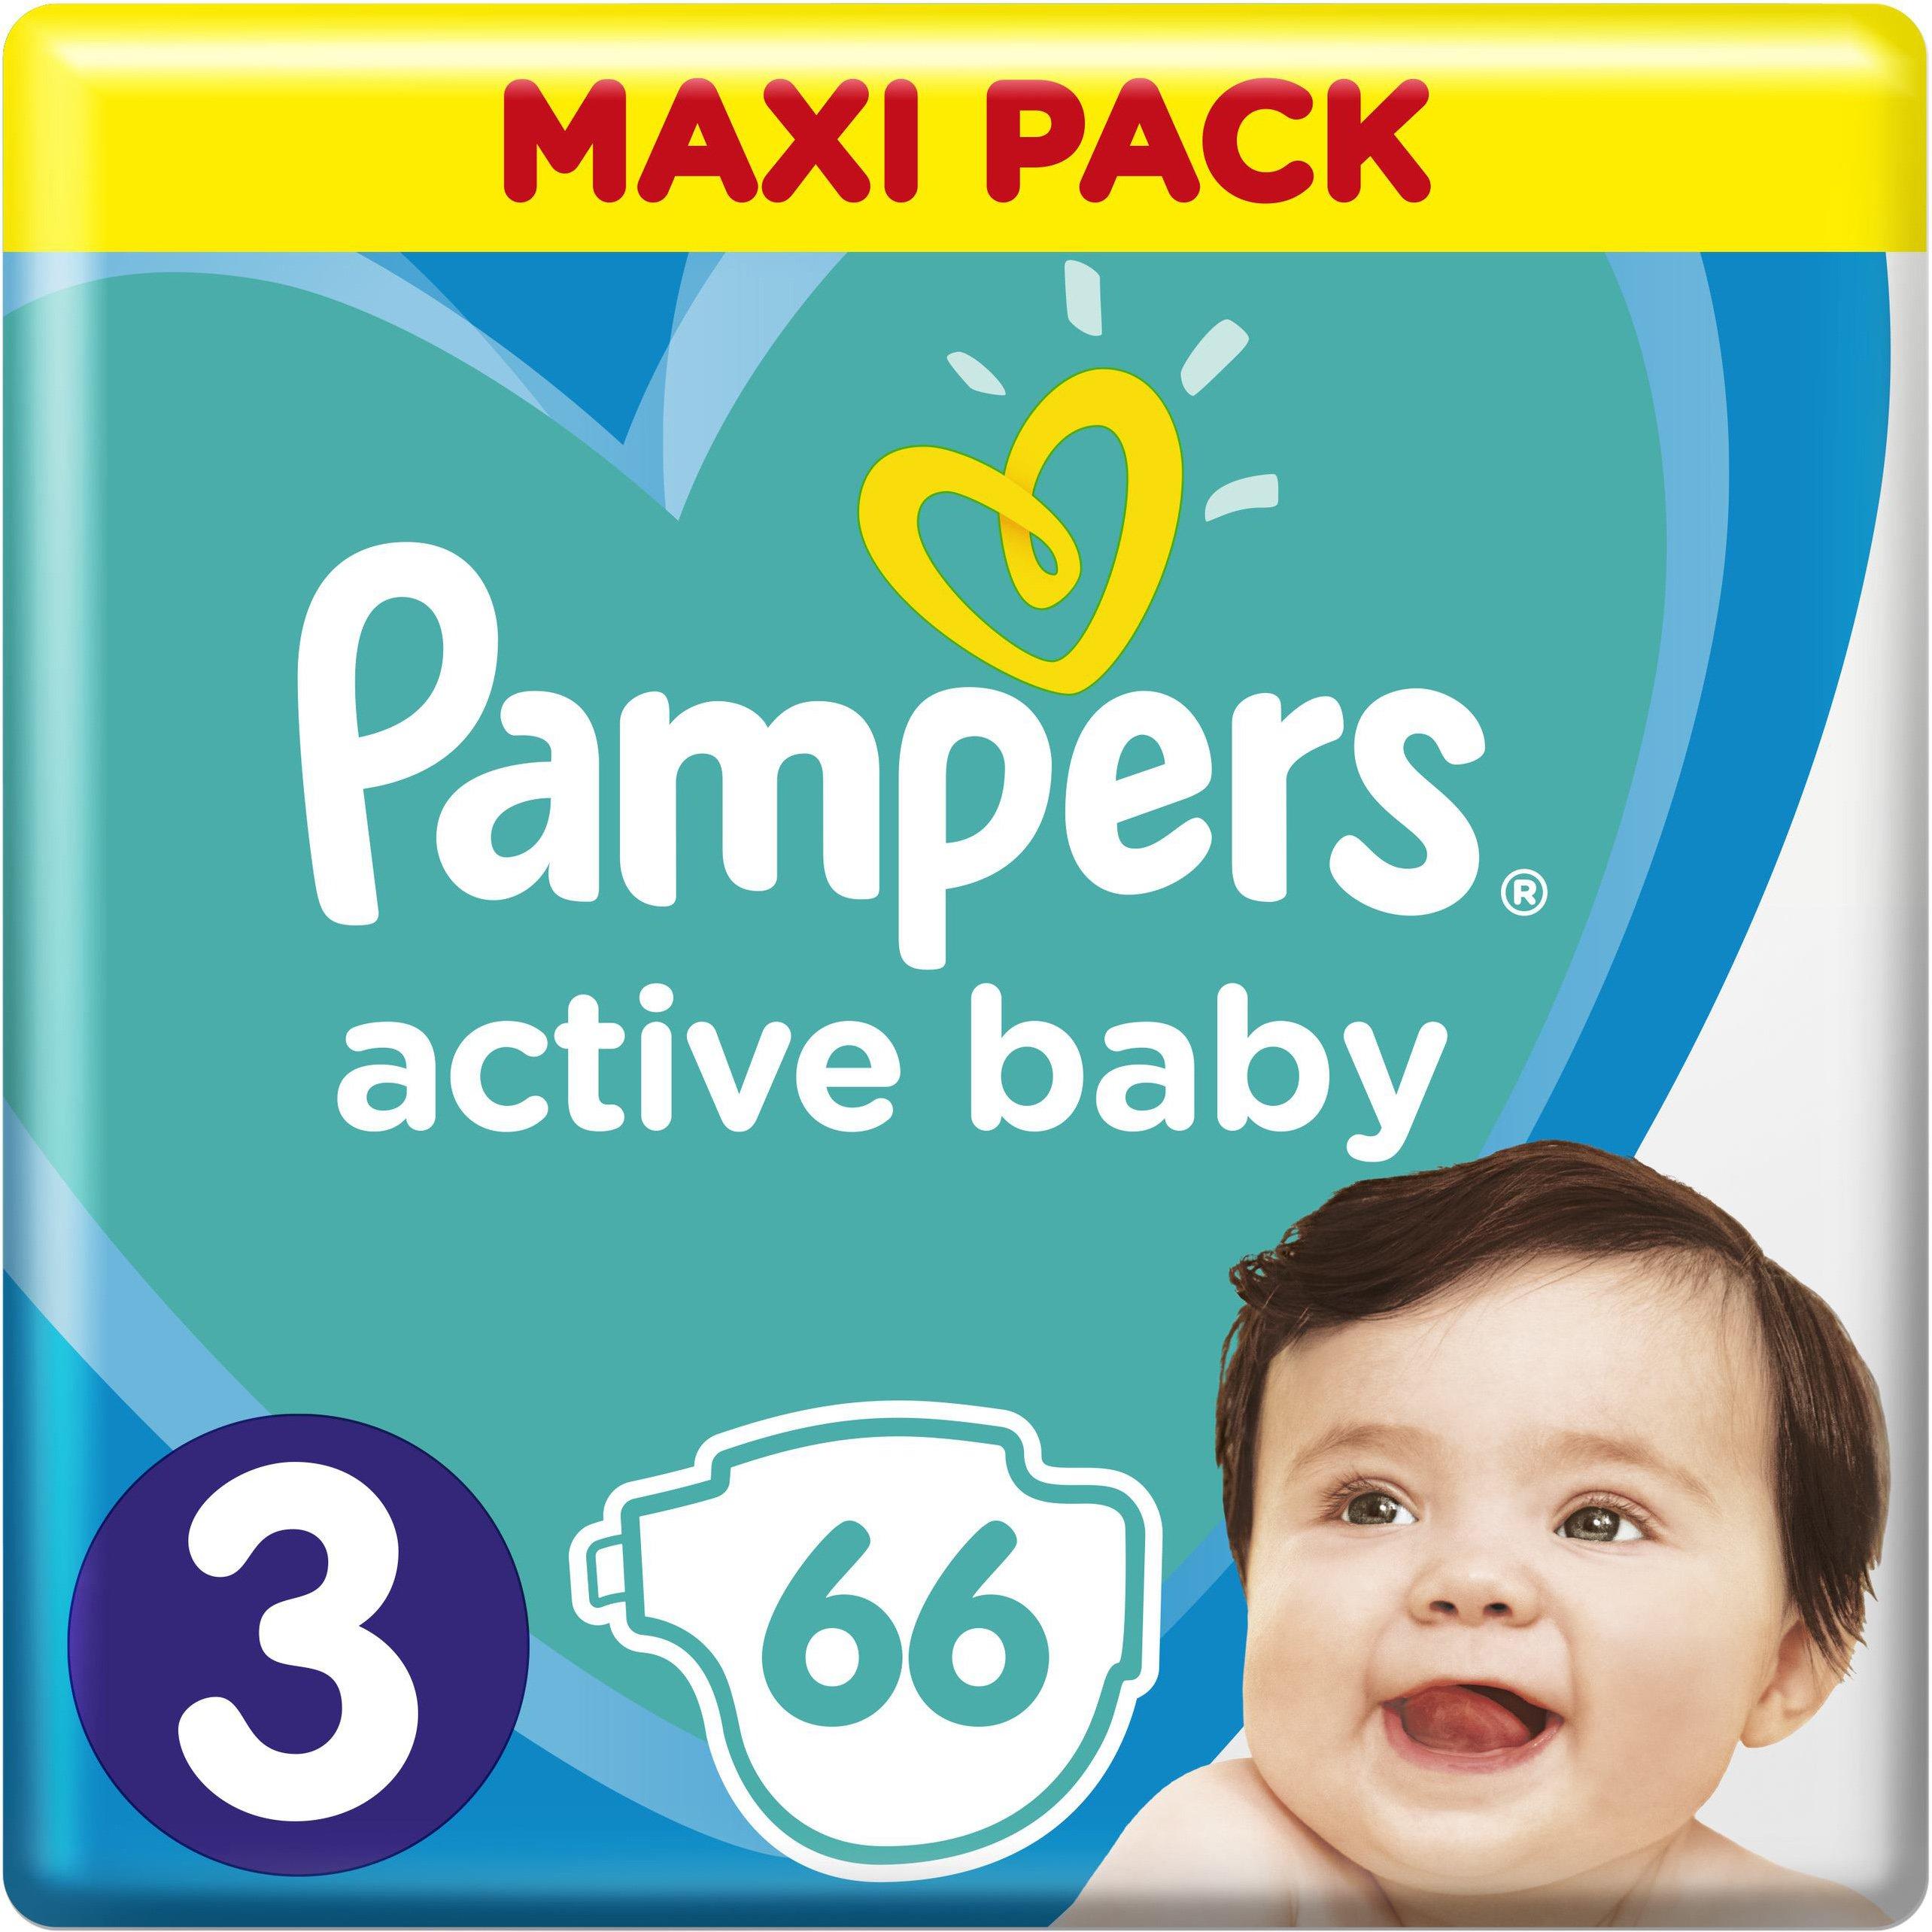 Pampers Active Baby Πάνες Maxi Pack No3 (6-10 kg), 66 Πάνες μητέρα παιδί   περιποίηση για το μωρό   πάνες για το μωρό